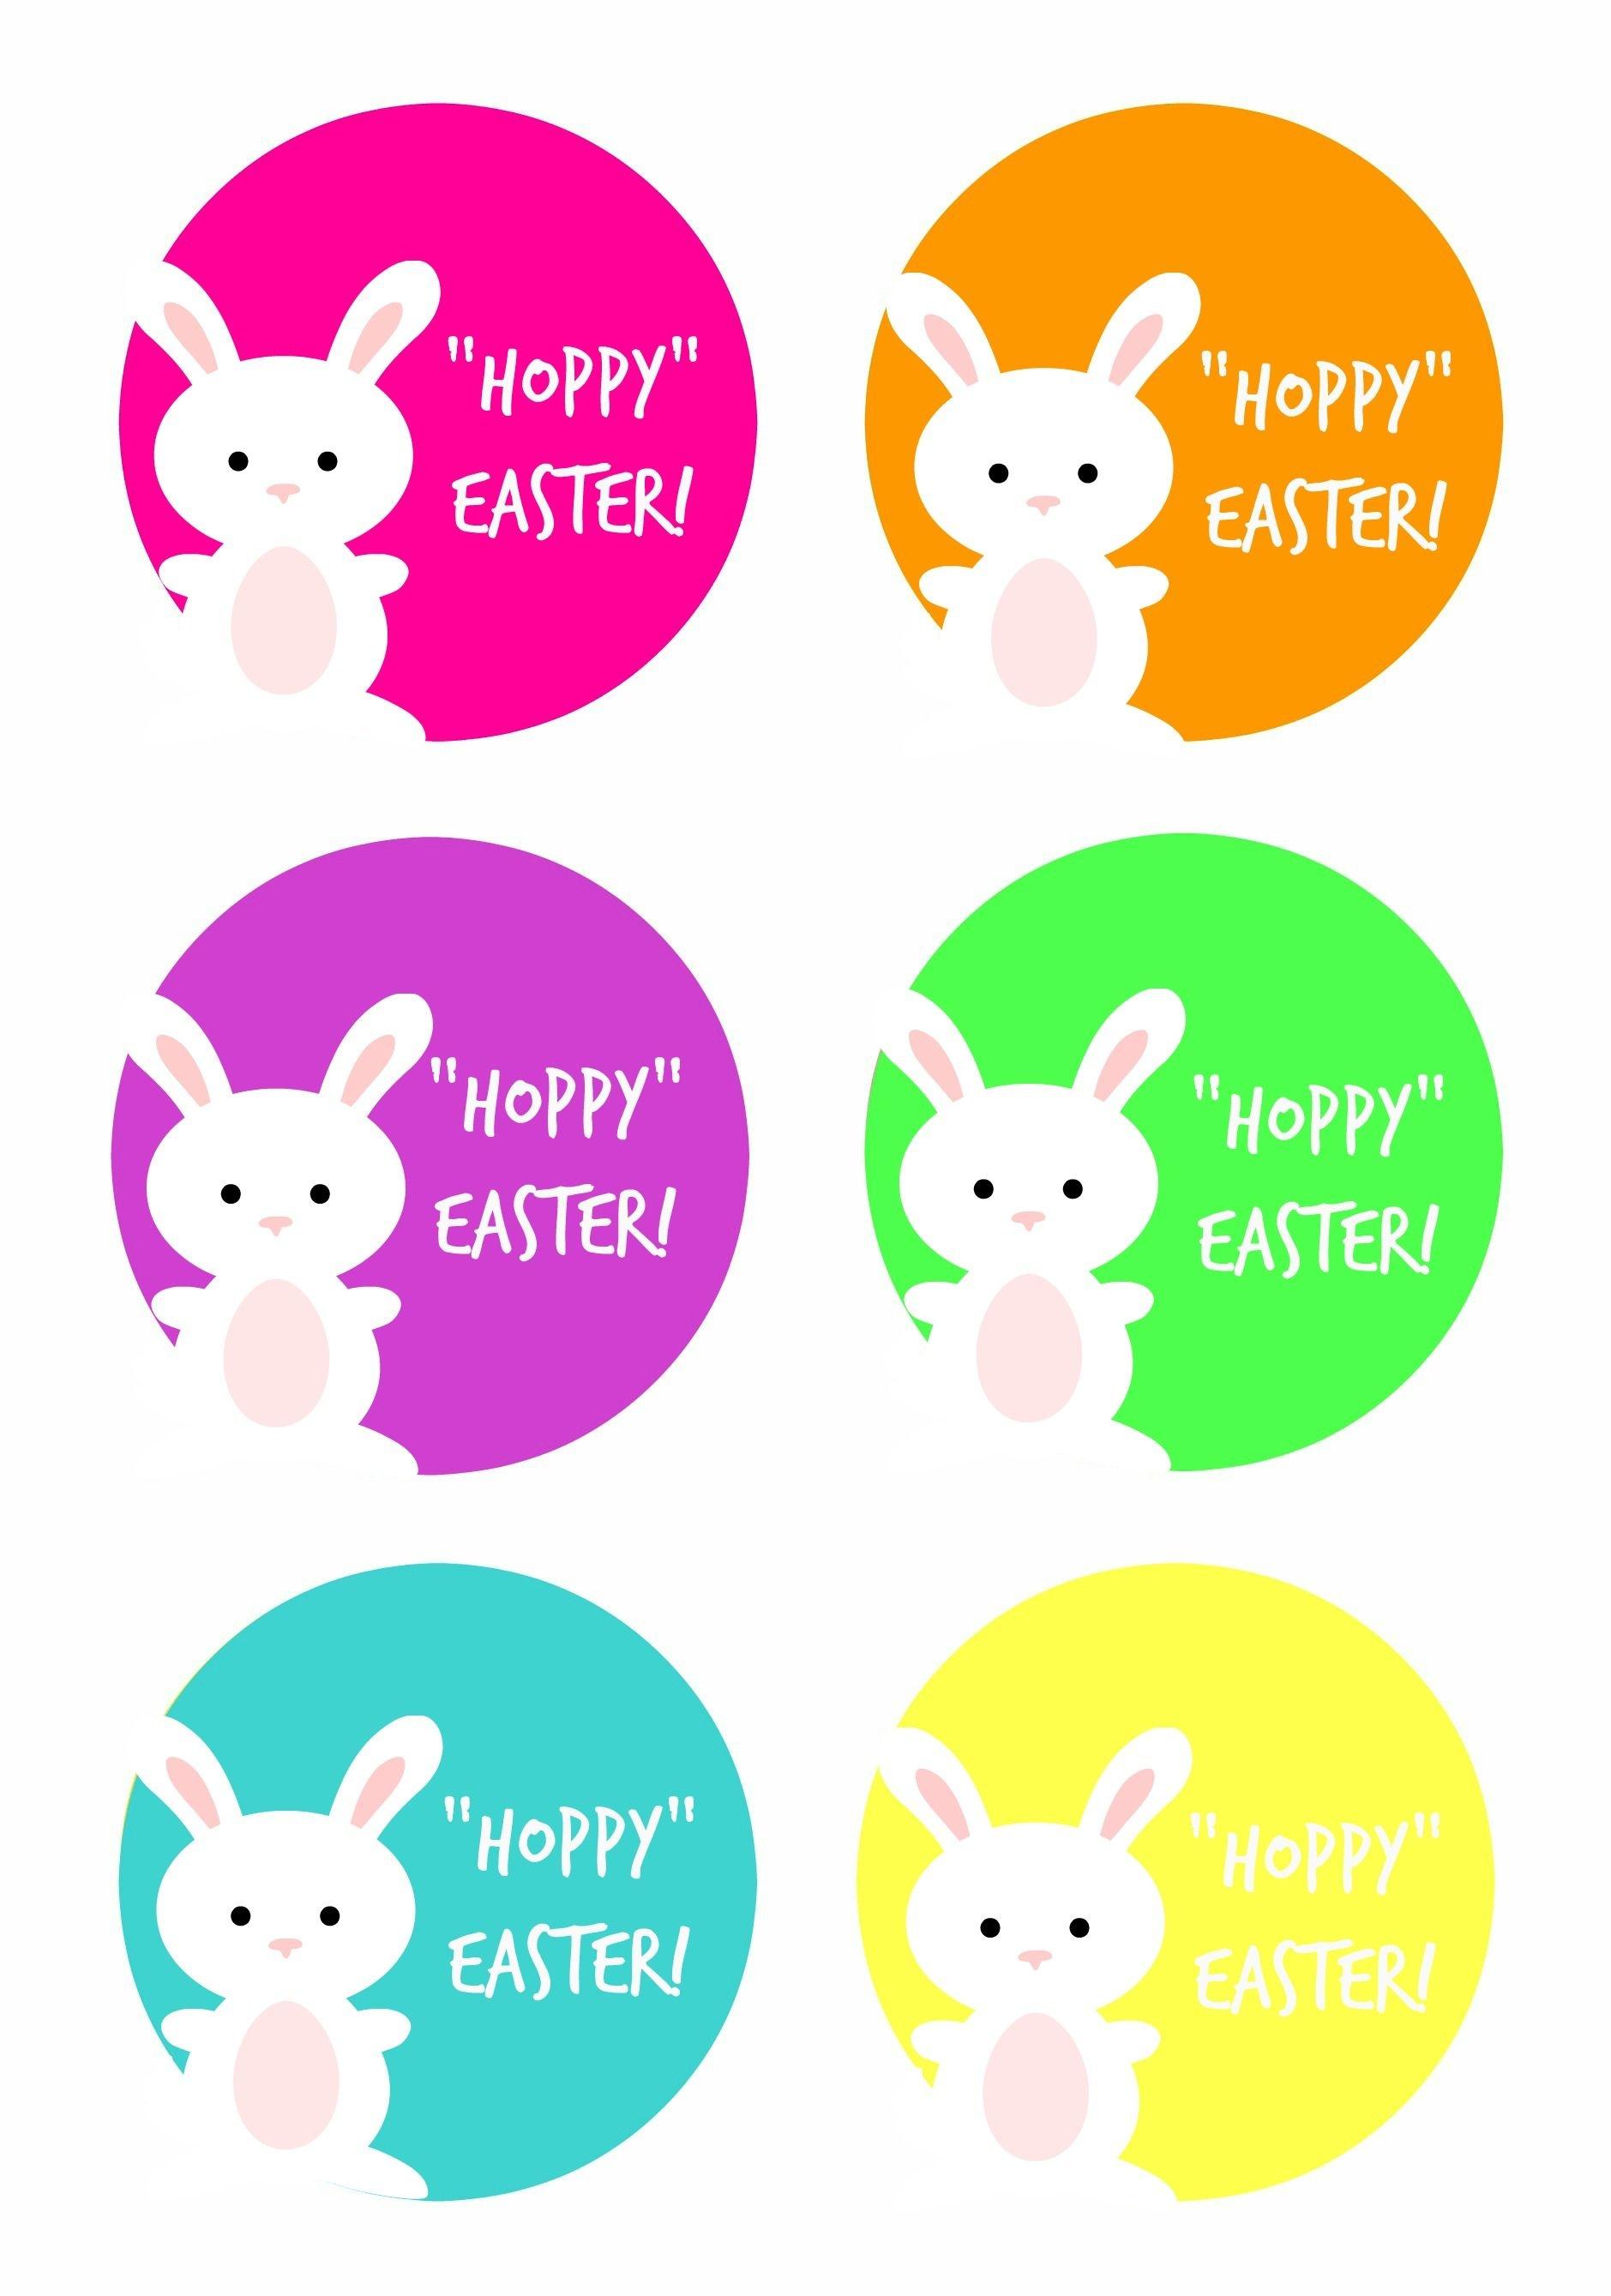 Free Easter Gift Tag Printable   Free Printables!   Gift Tags - Free Printable Easter Tags